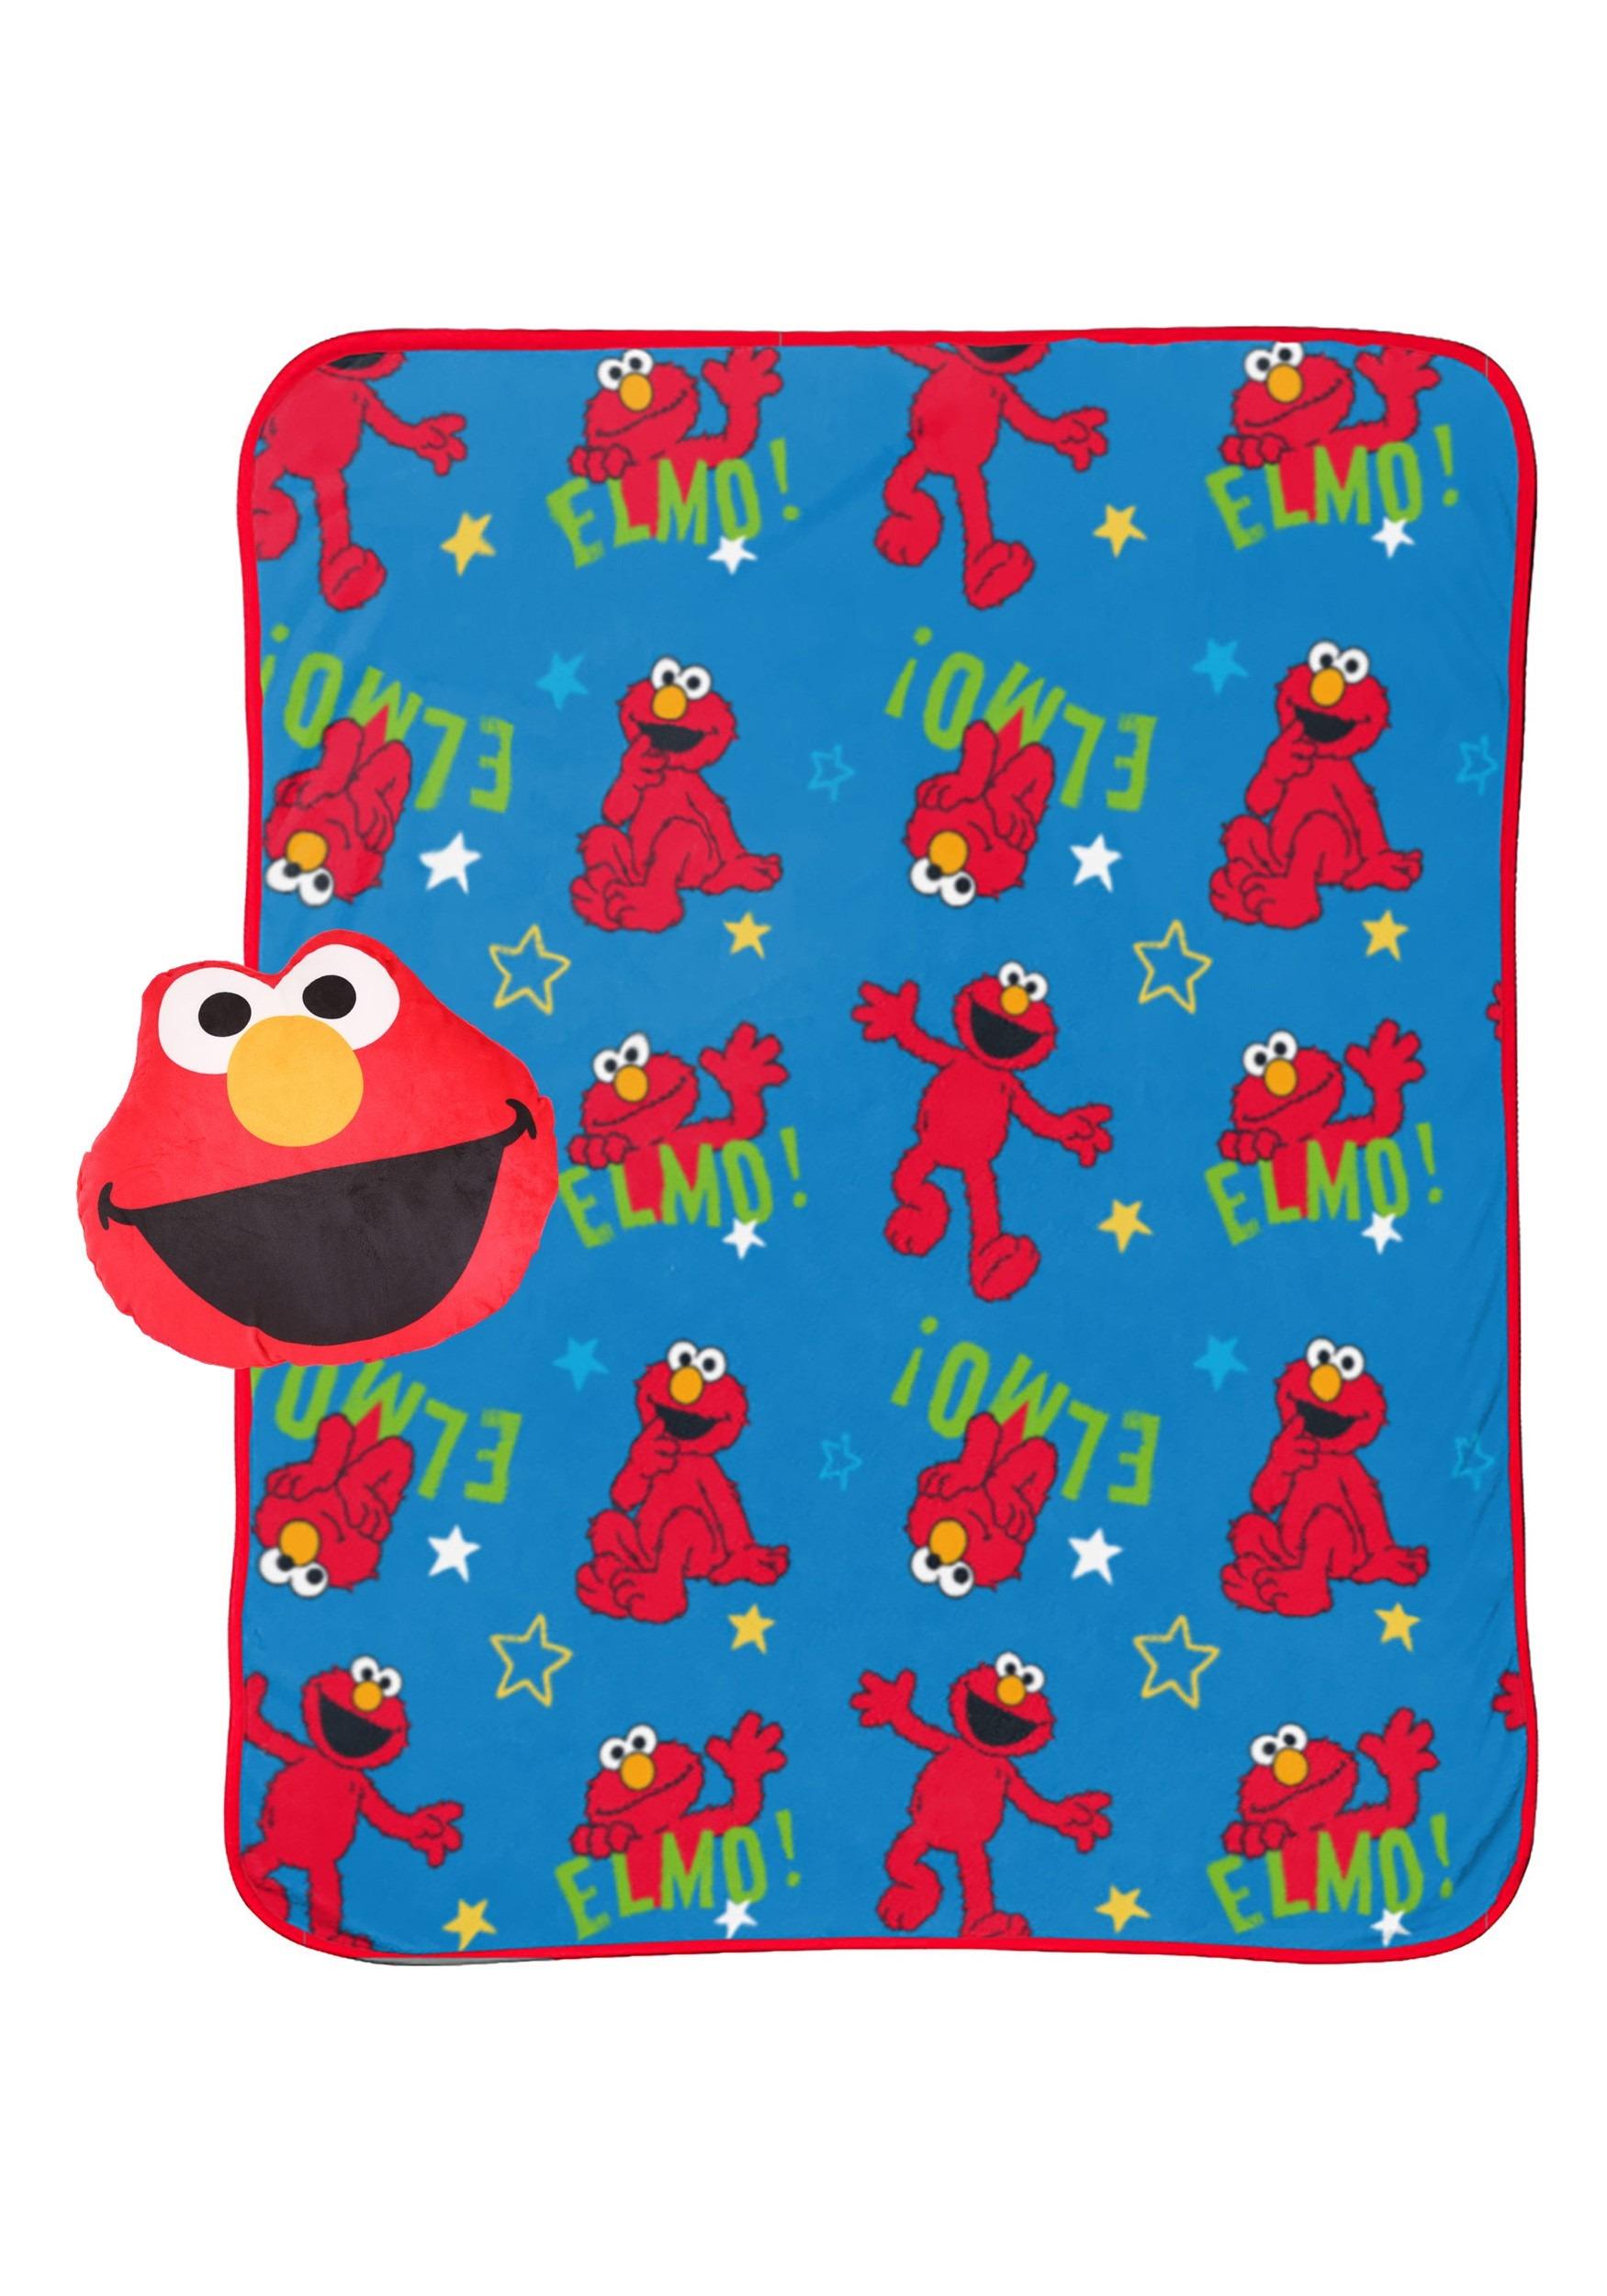 Sesame Street Blanket and Nogginz